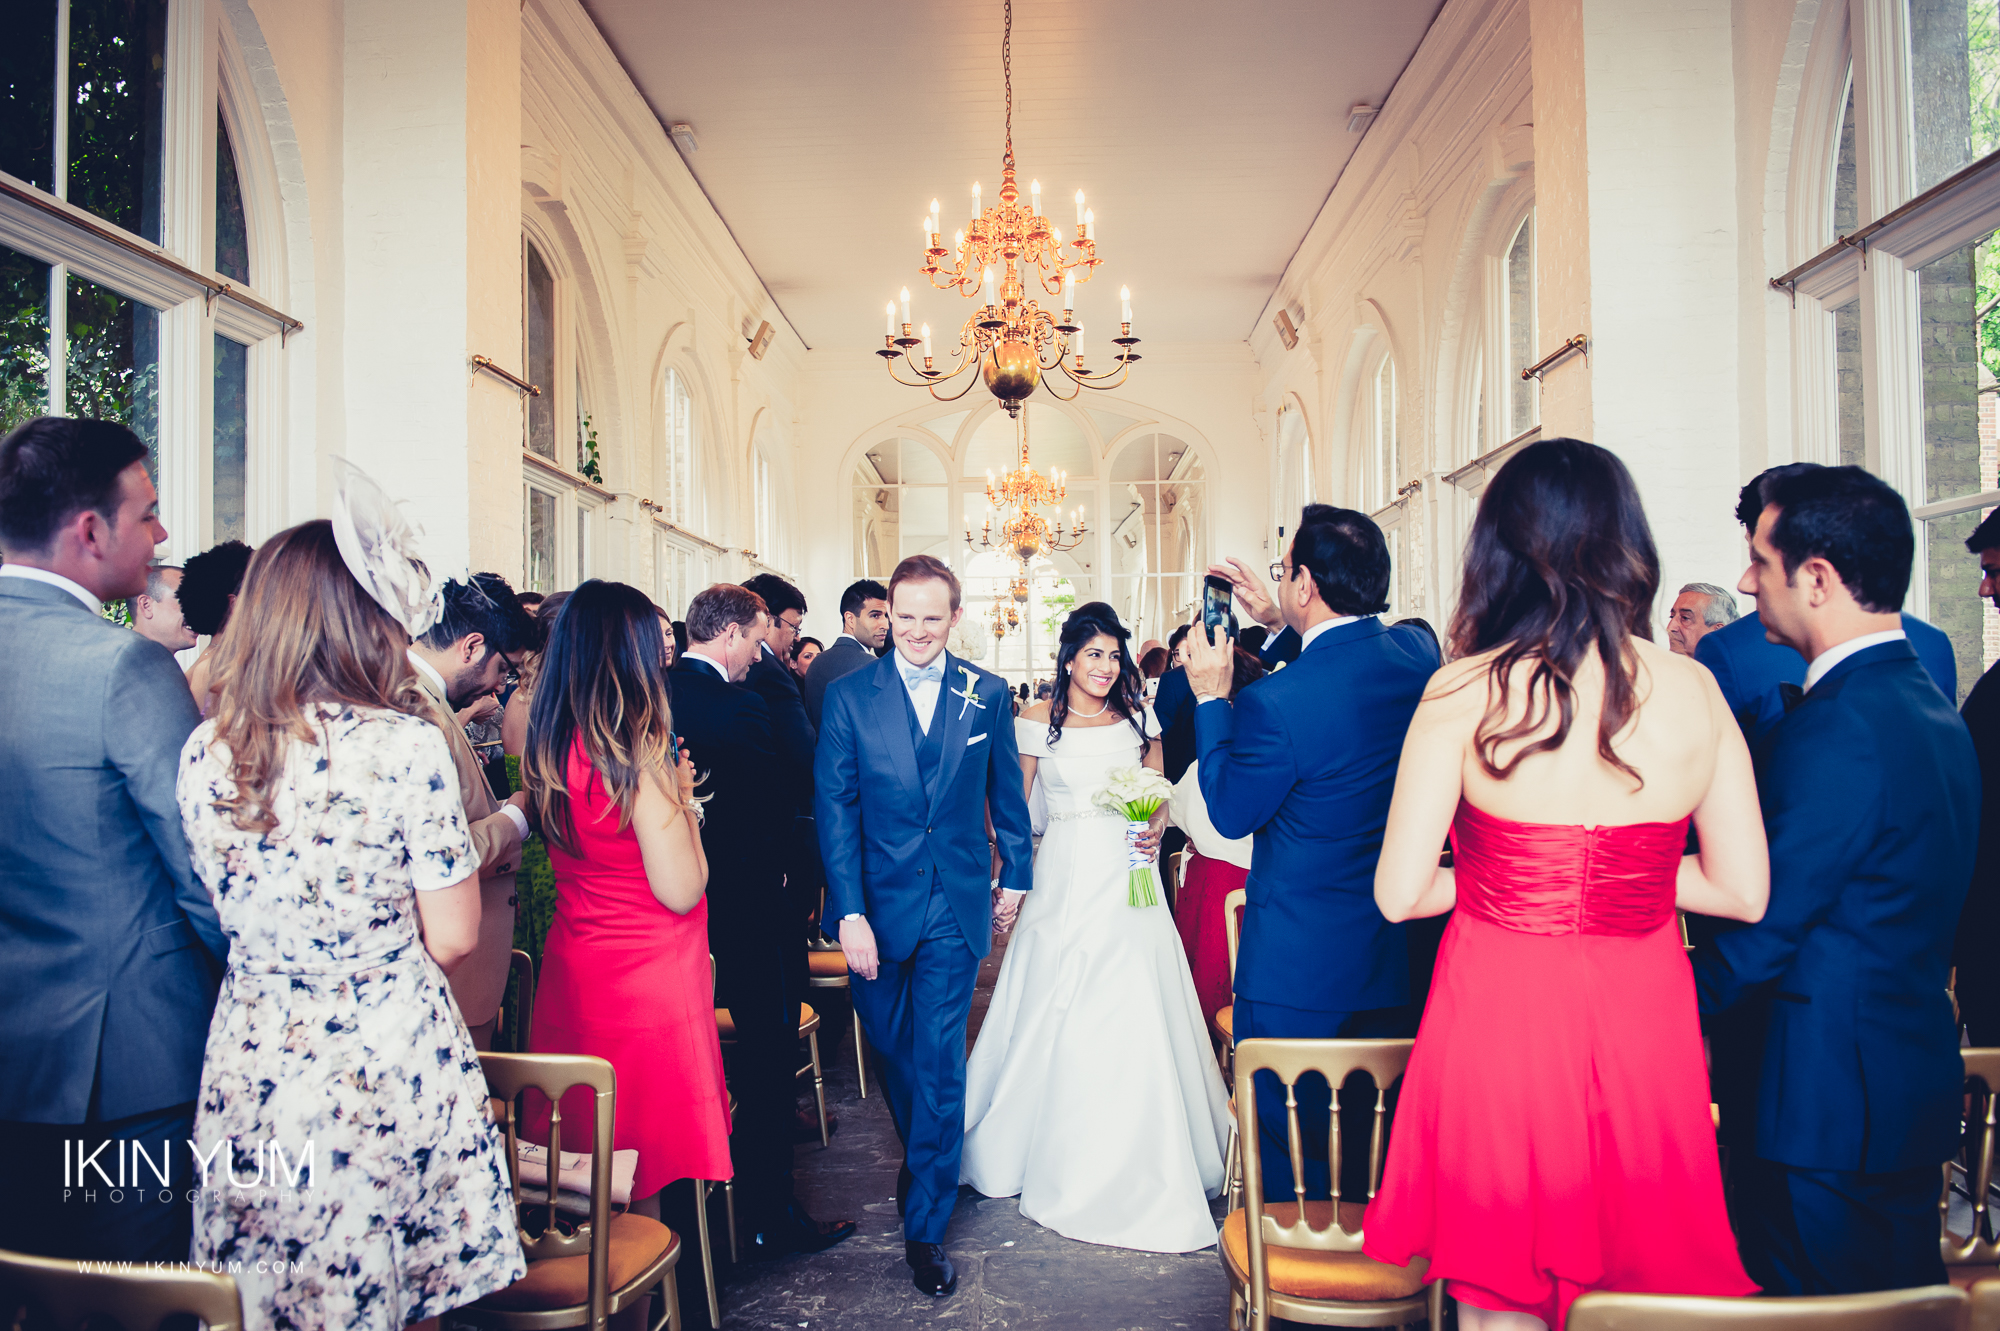 Holland Park Wedding - Ikin Yum Photography-0046.jpg